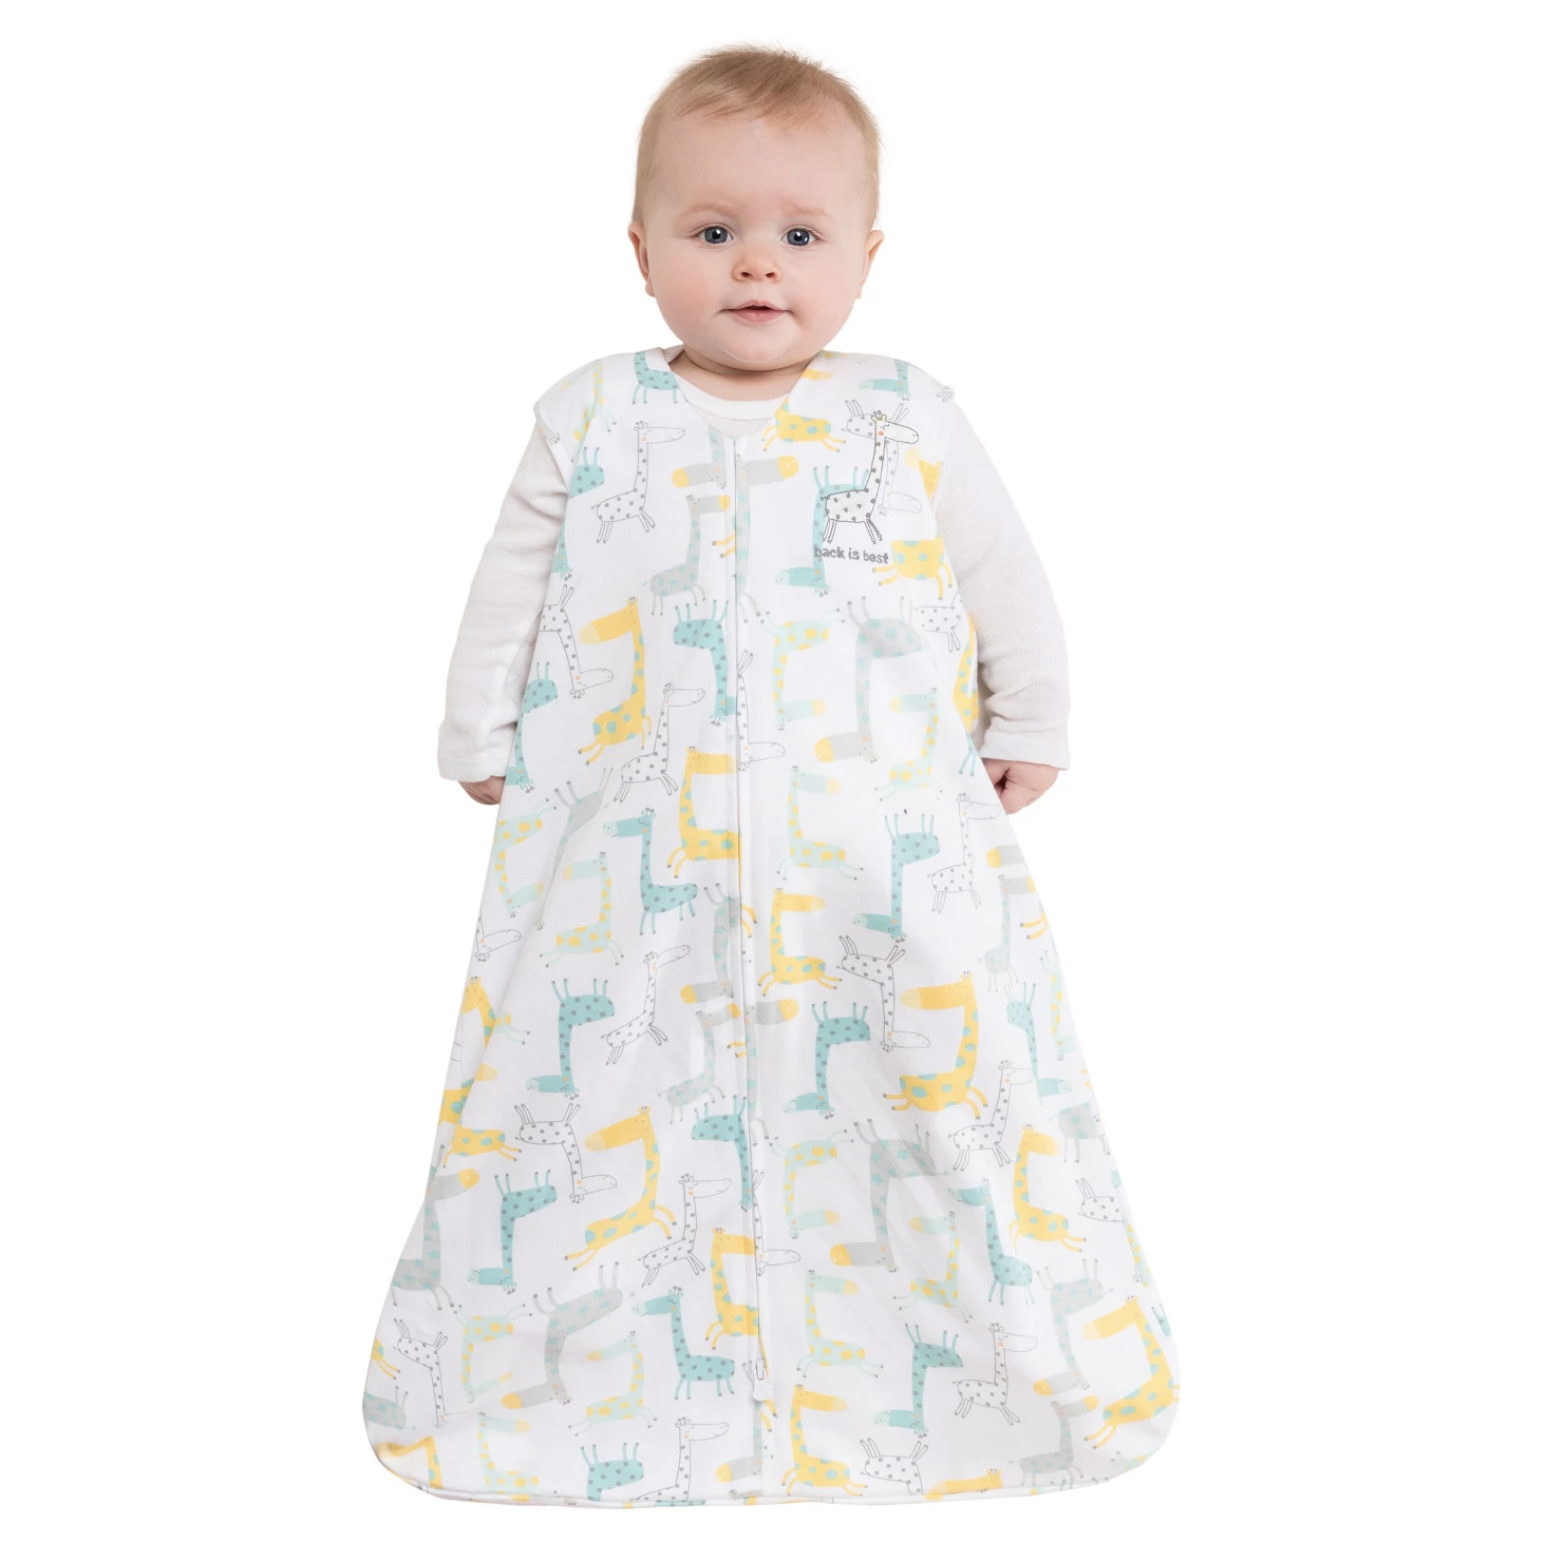 HALO Innovations Sleepsack 100% Cotton Wearable Blanket